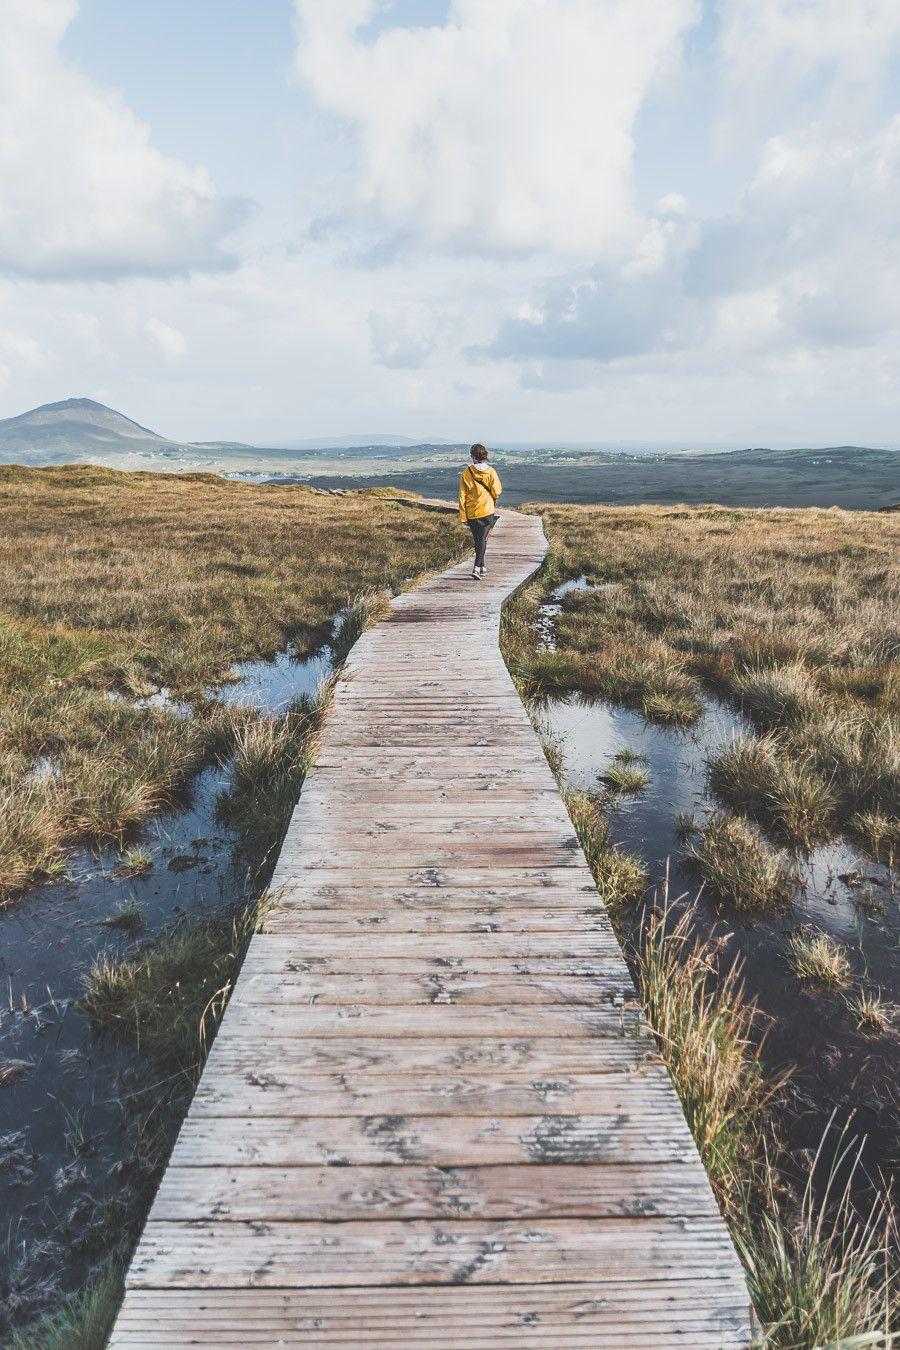 Diamond Hill - Connemara National Park